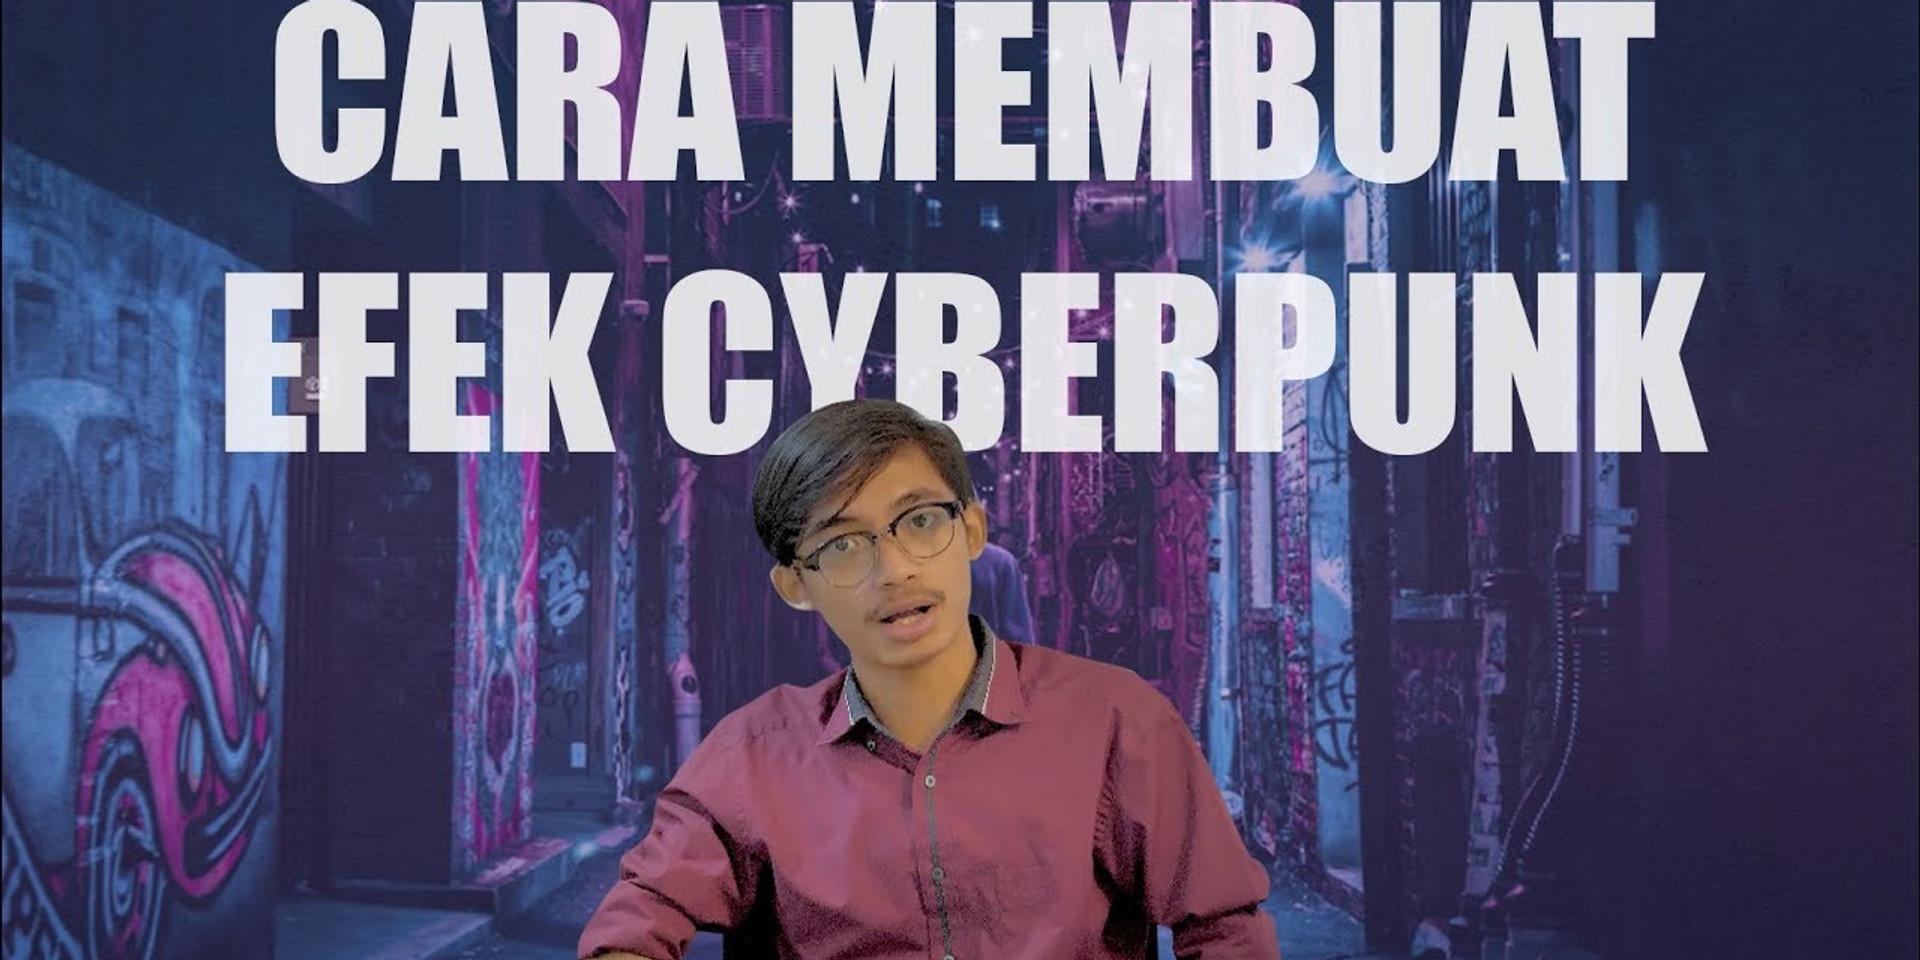 Tutorial Photoshop: Cara Membuat Efek Cyberpunk